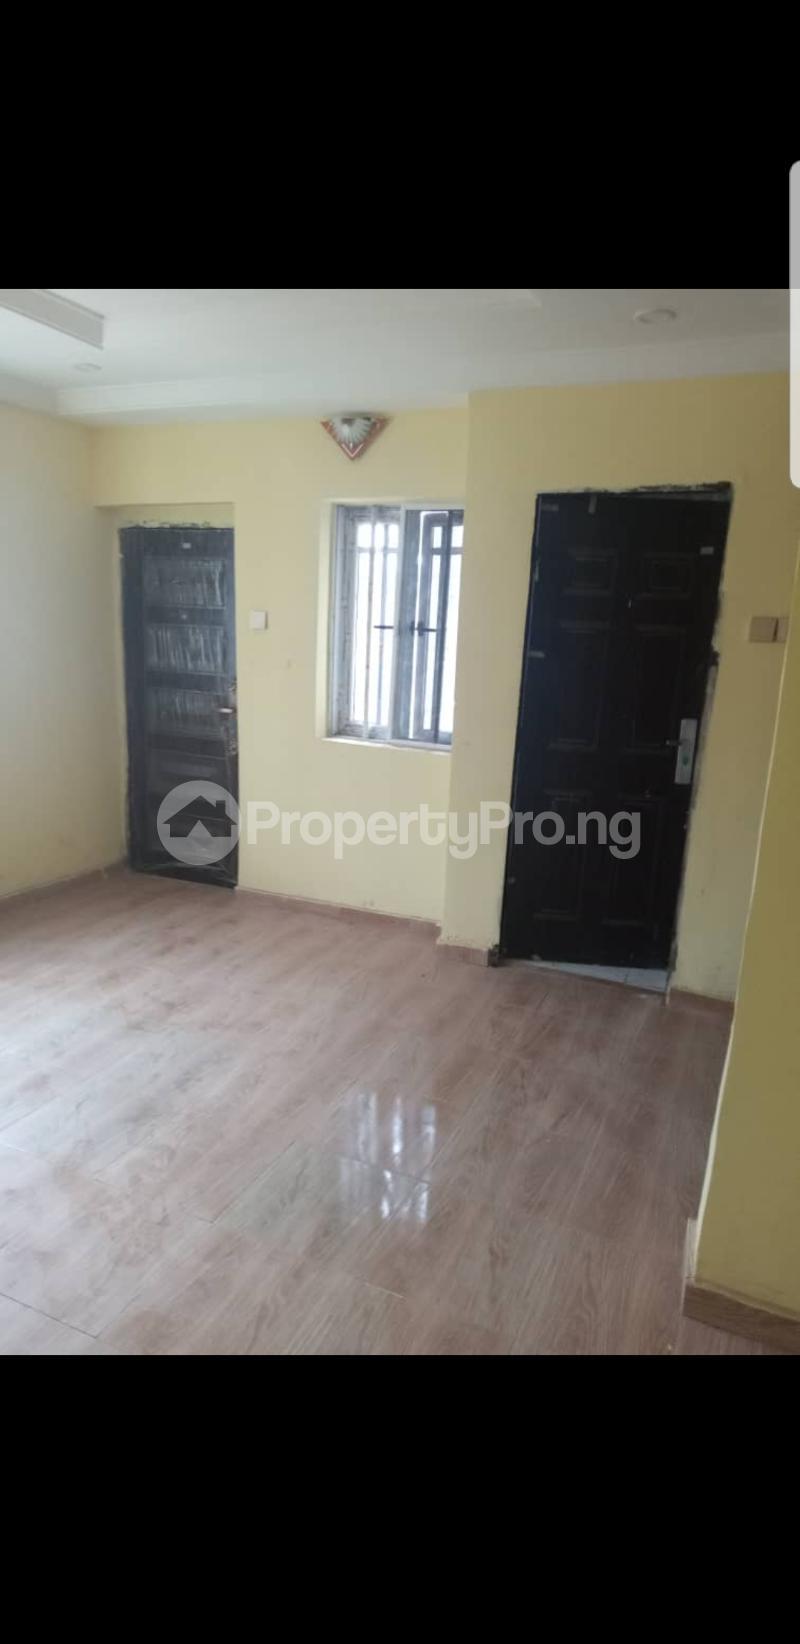 3 bedroom Shared Apartment Flat / Apartment for rent Enugu Enugu - 8